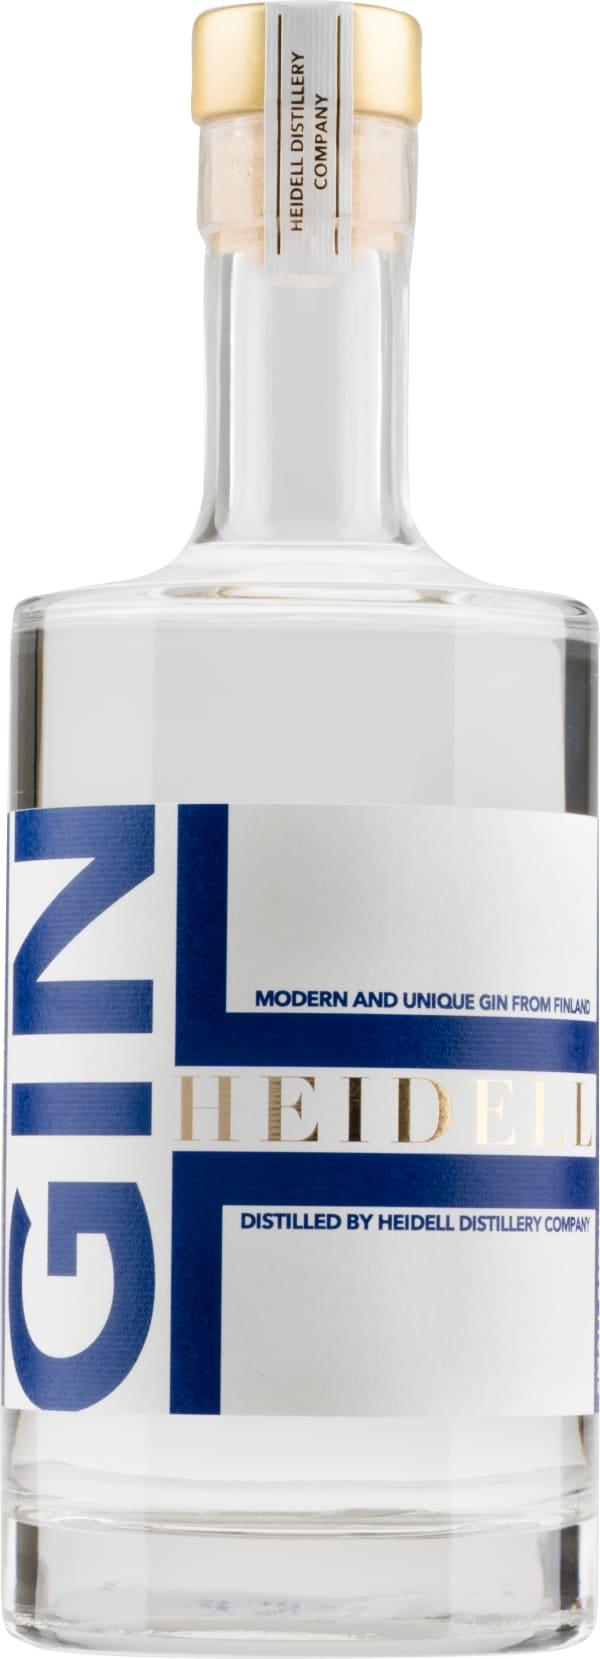 Heidell Gin